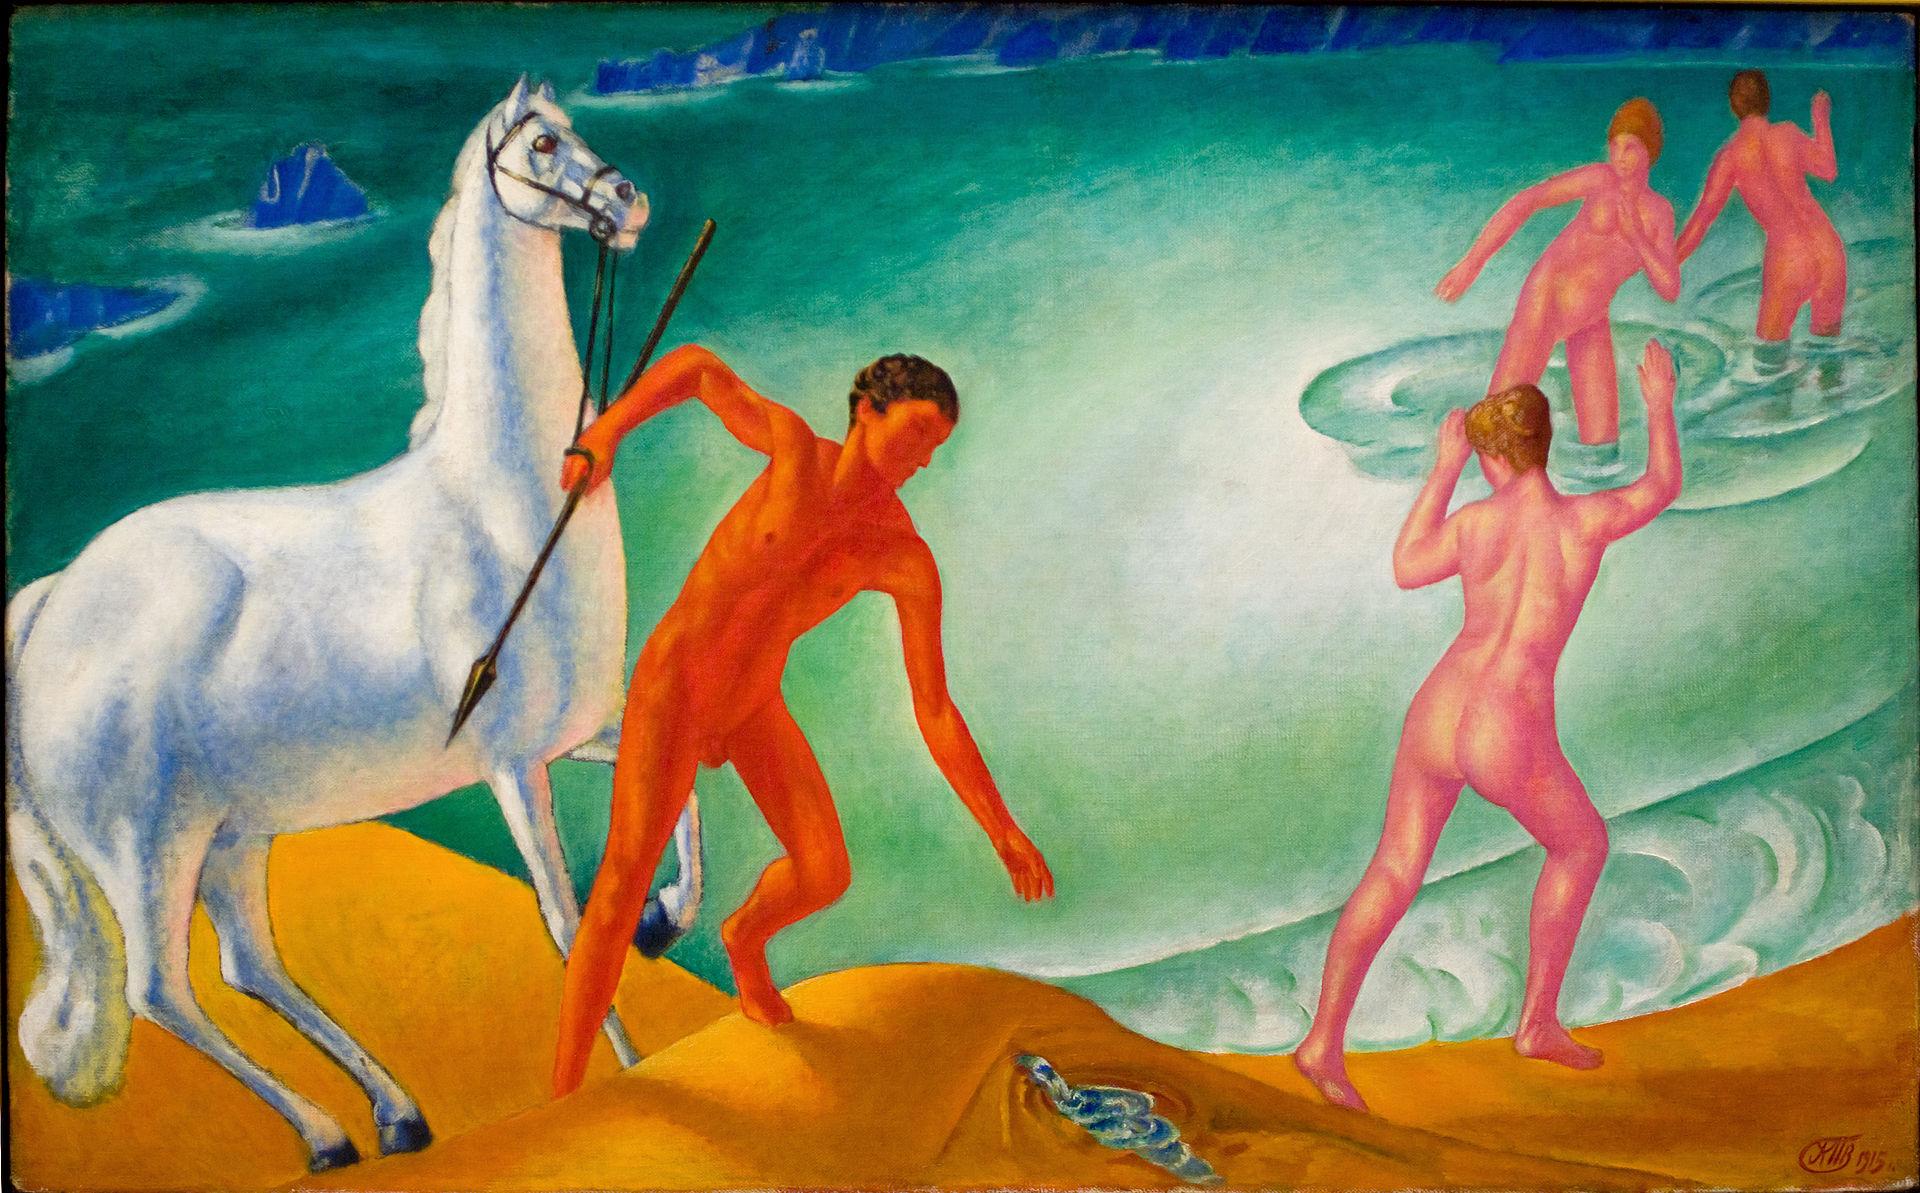 Thirsty Warrior  | Kuzma Petrov-Vodkin (1915)